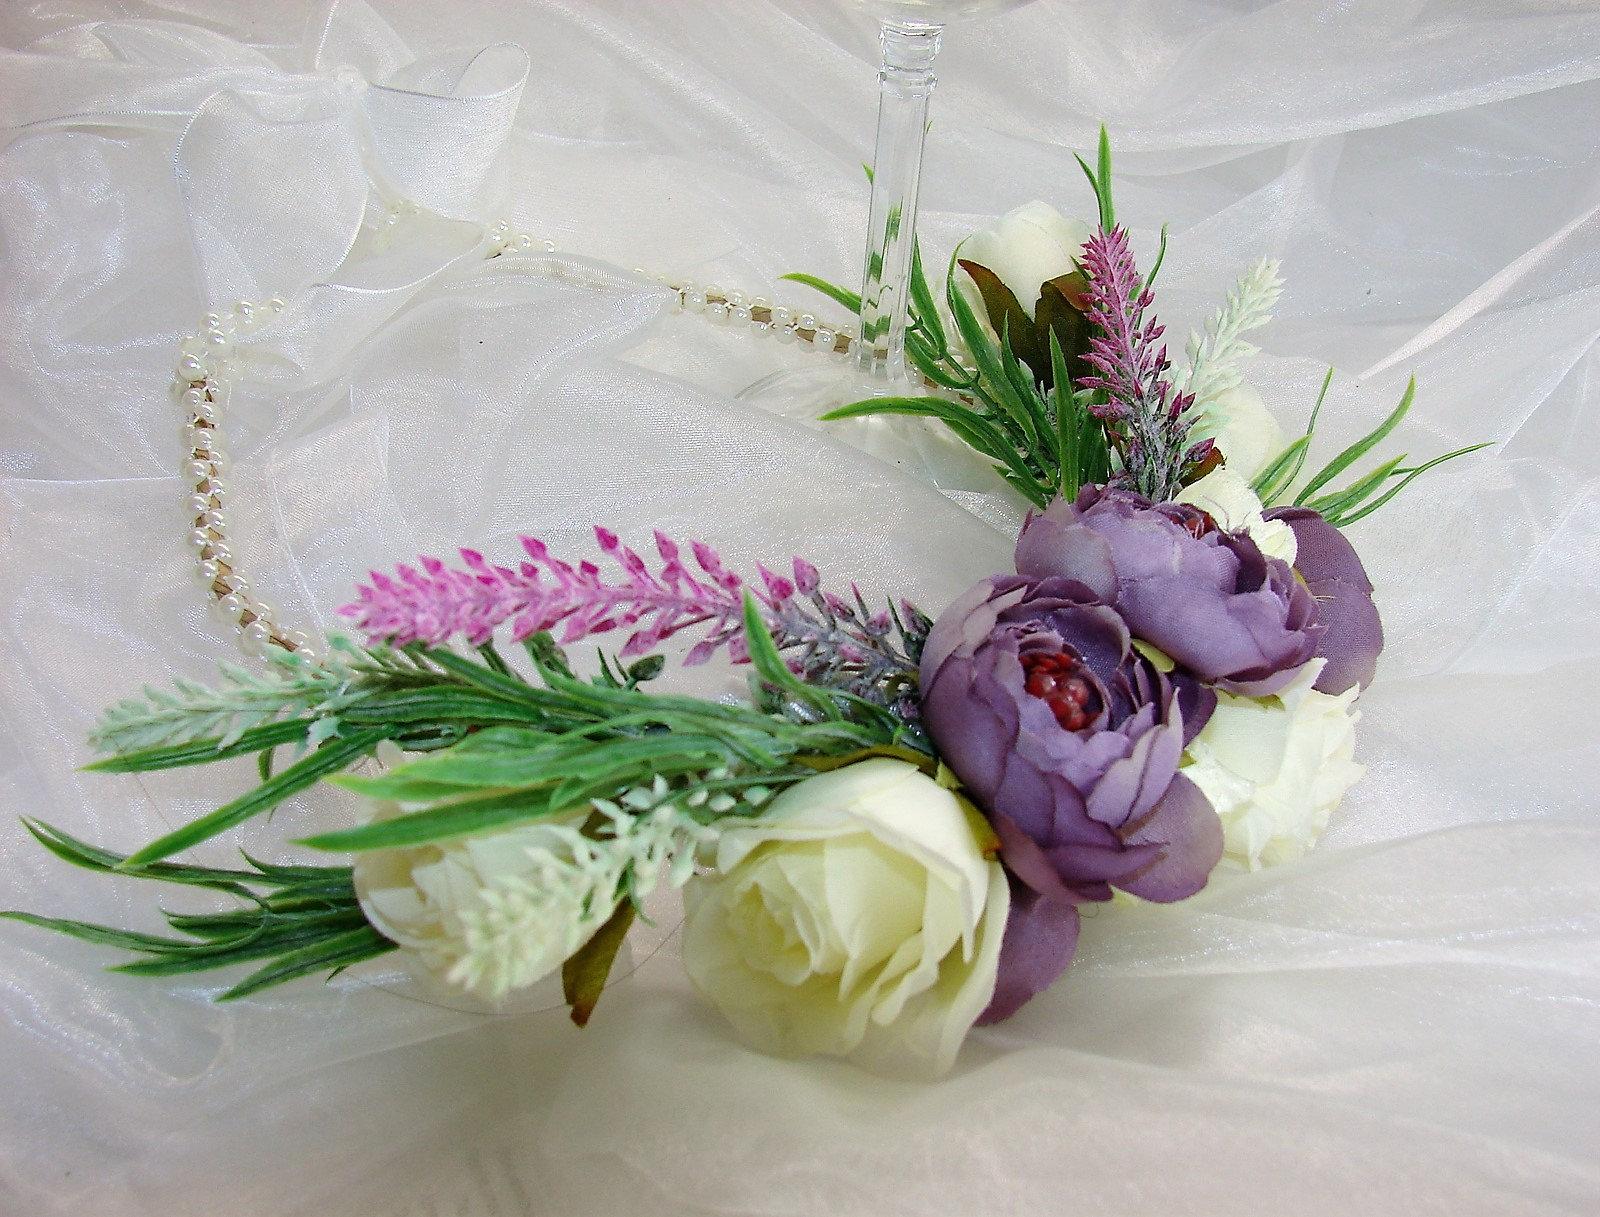 Boho flower crown wedding hair accessory purple peonies white boho flower crown wedding hair accessory purple peonies white roses lilac lavender pearl beaded adjustable with organza ribbon izmirmasajfo